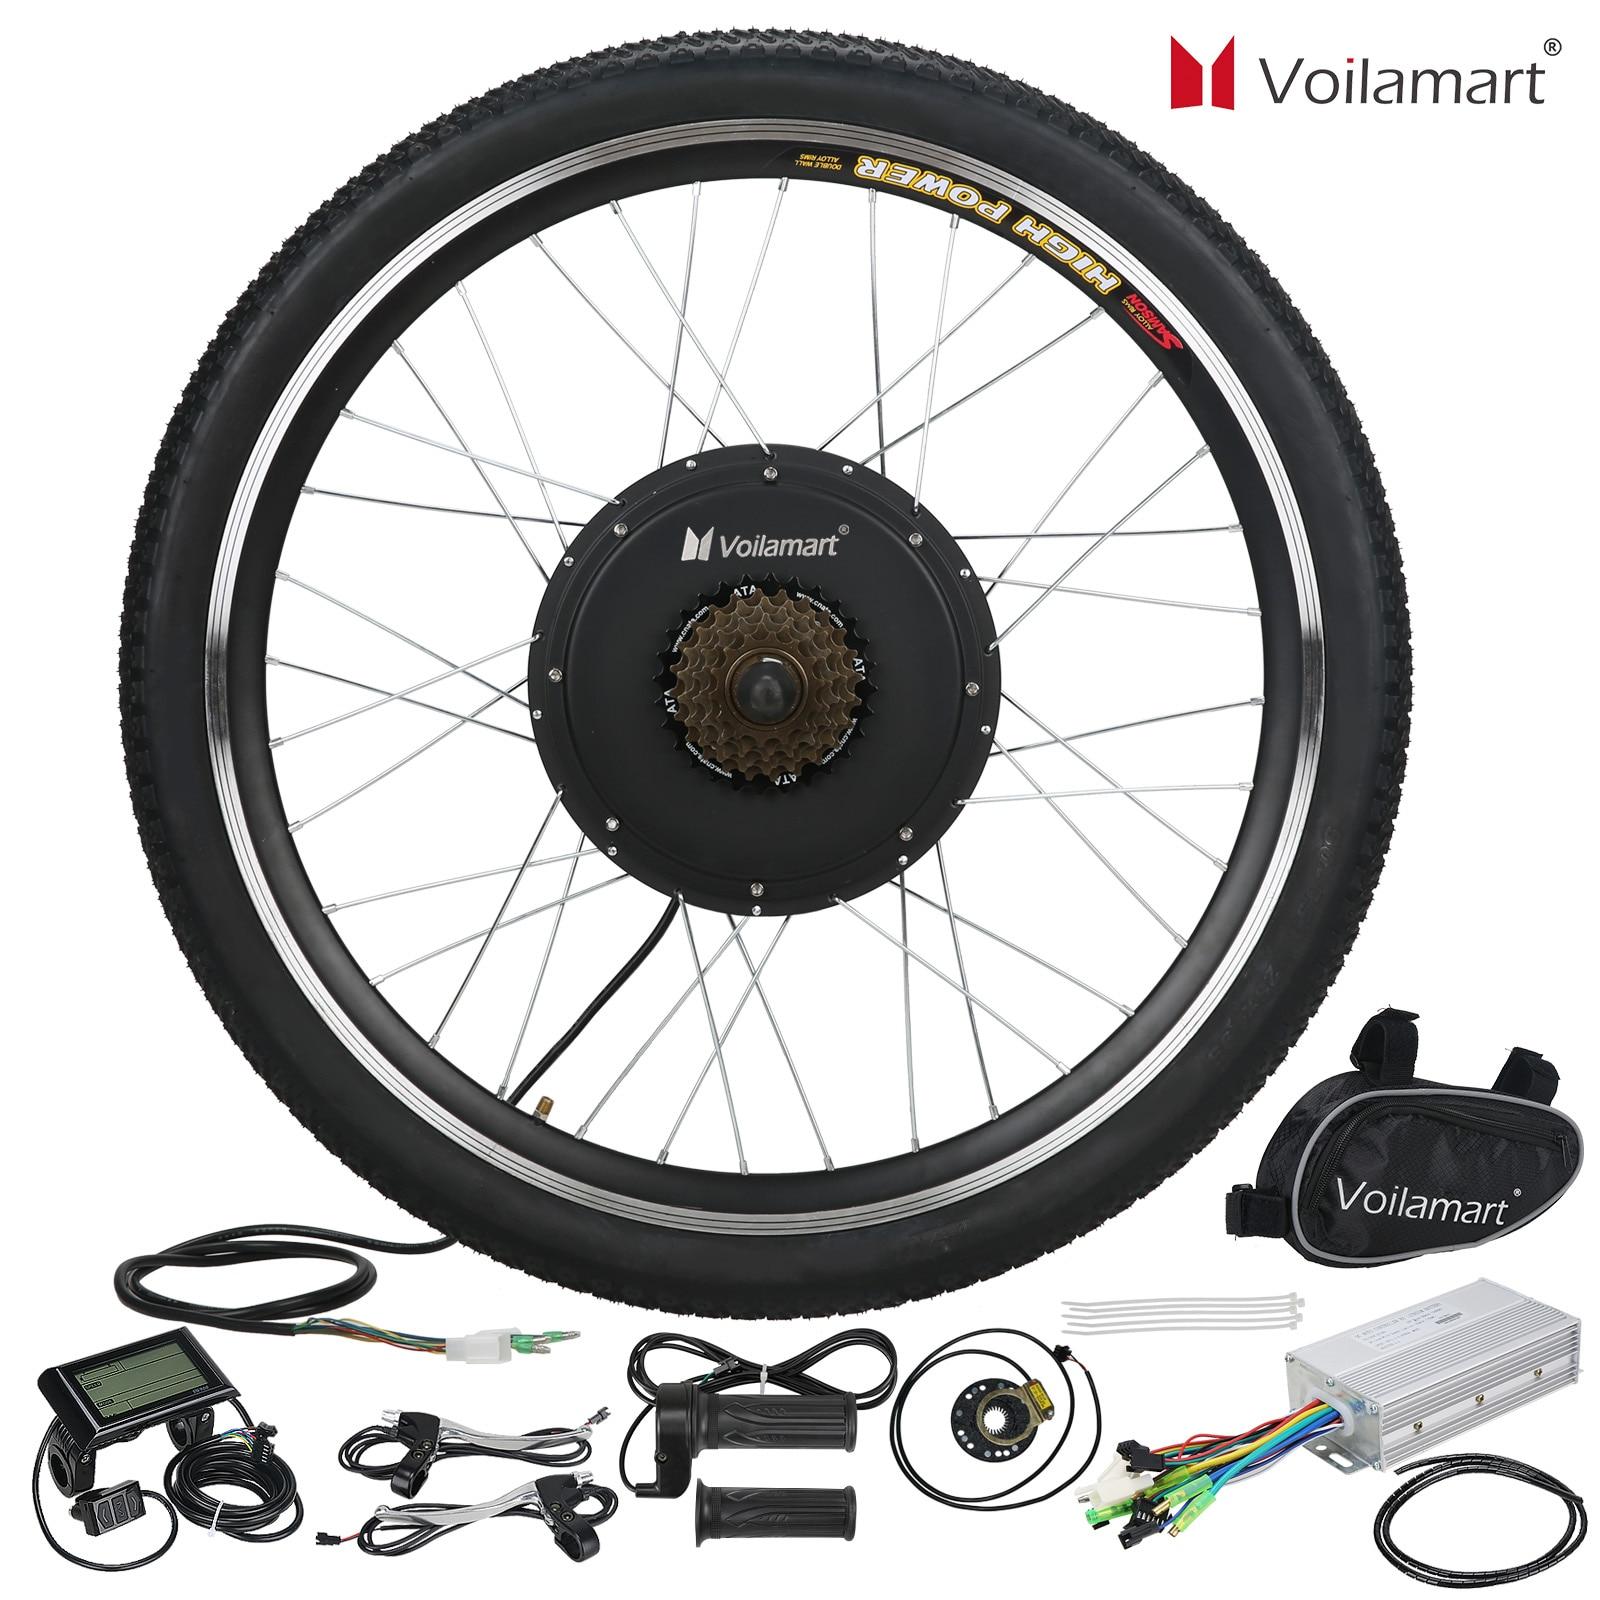 LCD 1000W Fat Bike Fat Wheel Electric Bicycle E Bike Hub Motor Conversion Kit